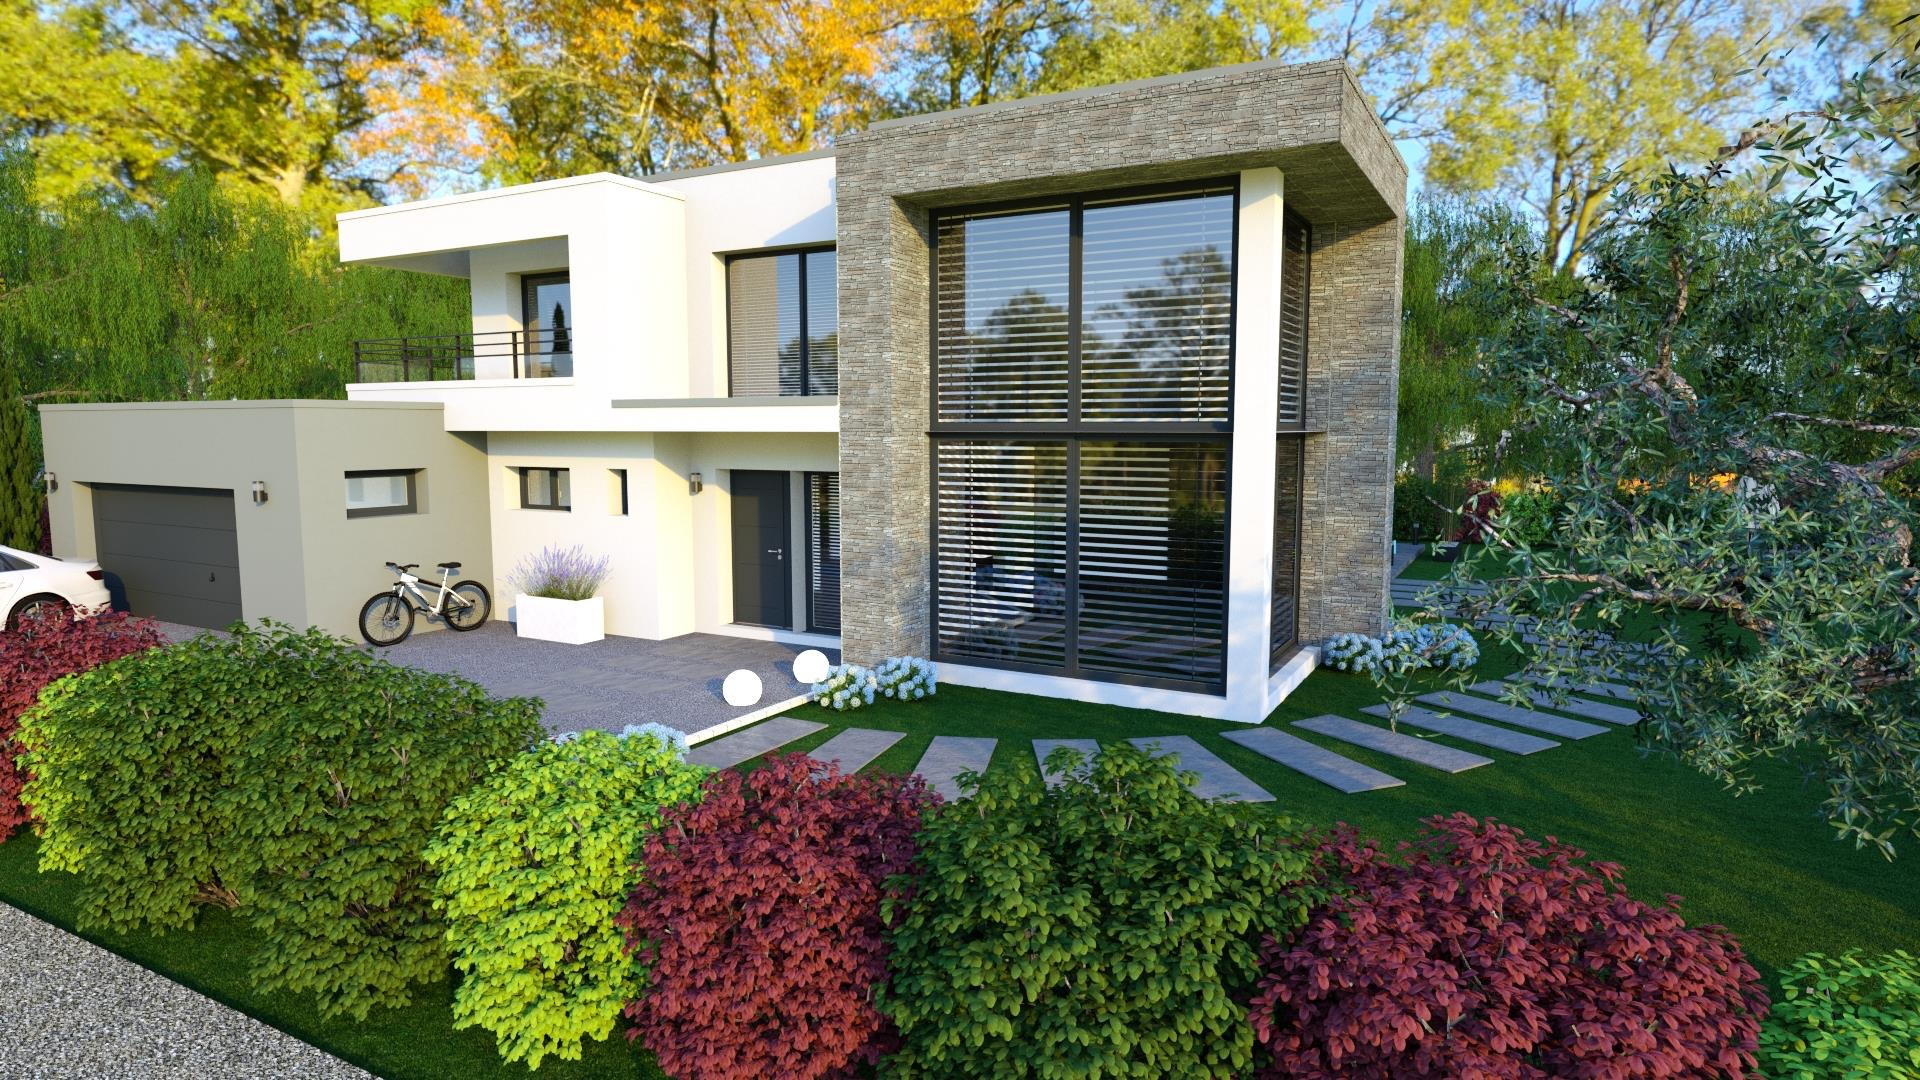 Maison Toiture Terrasse Avec Garage Double